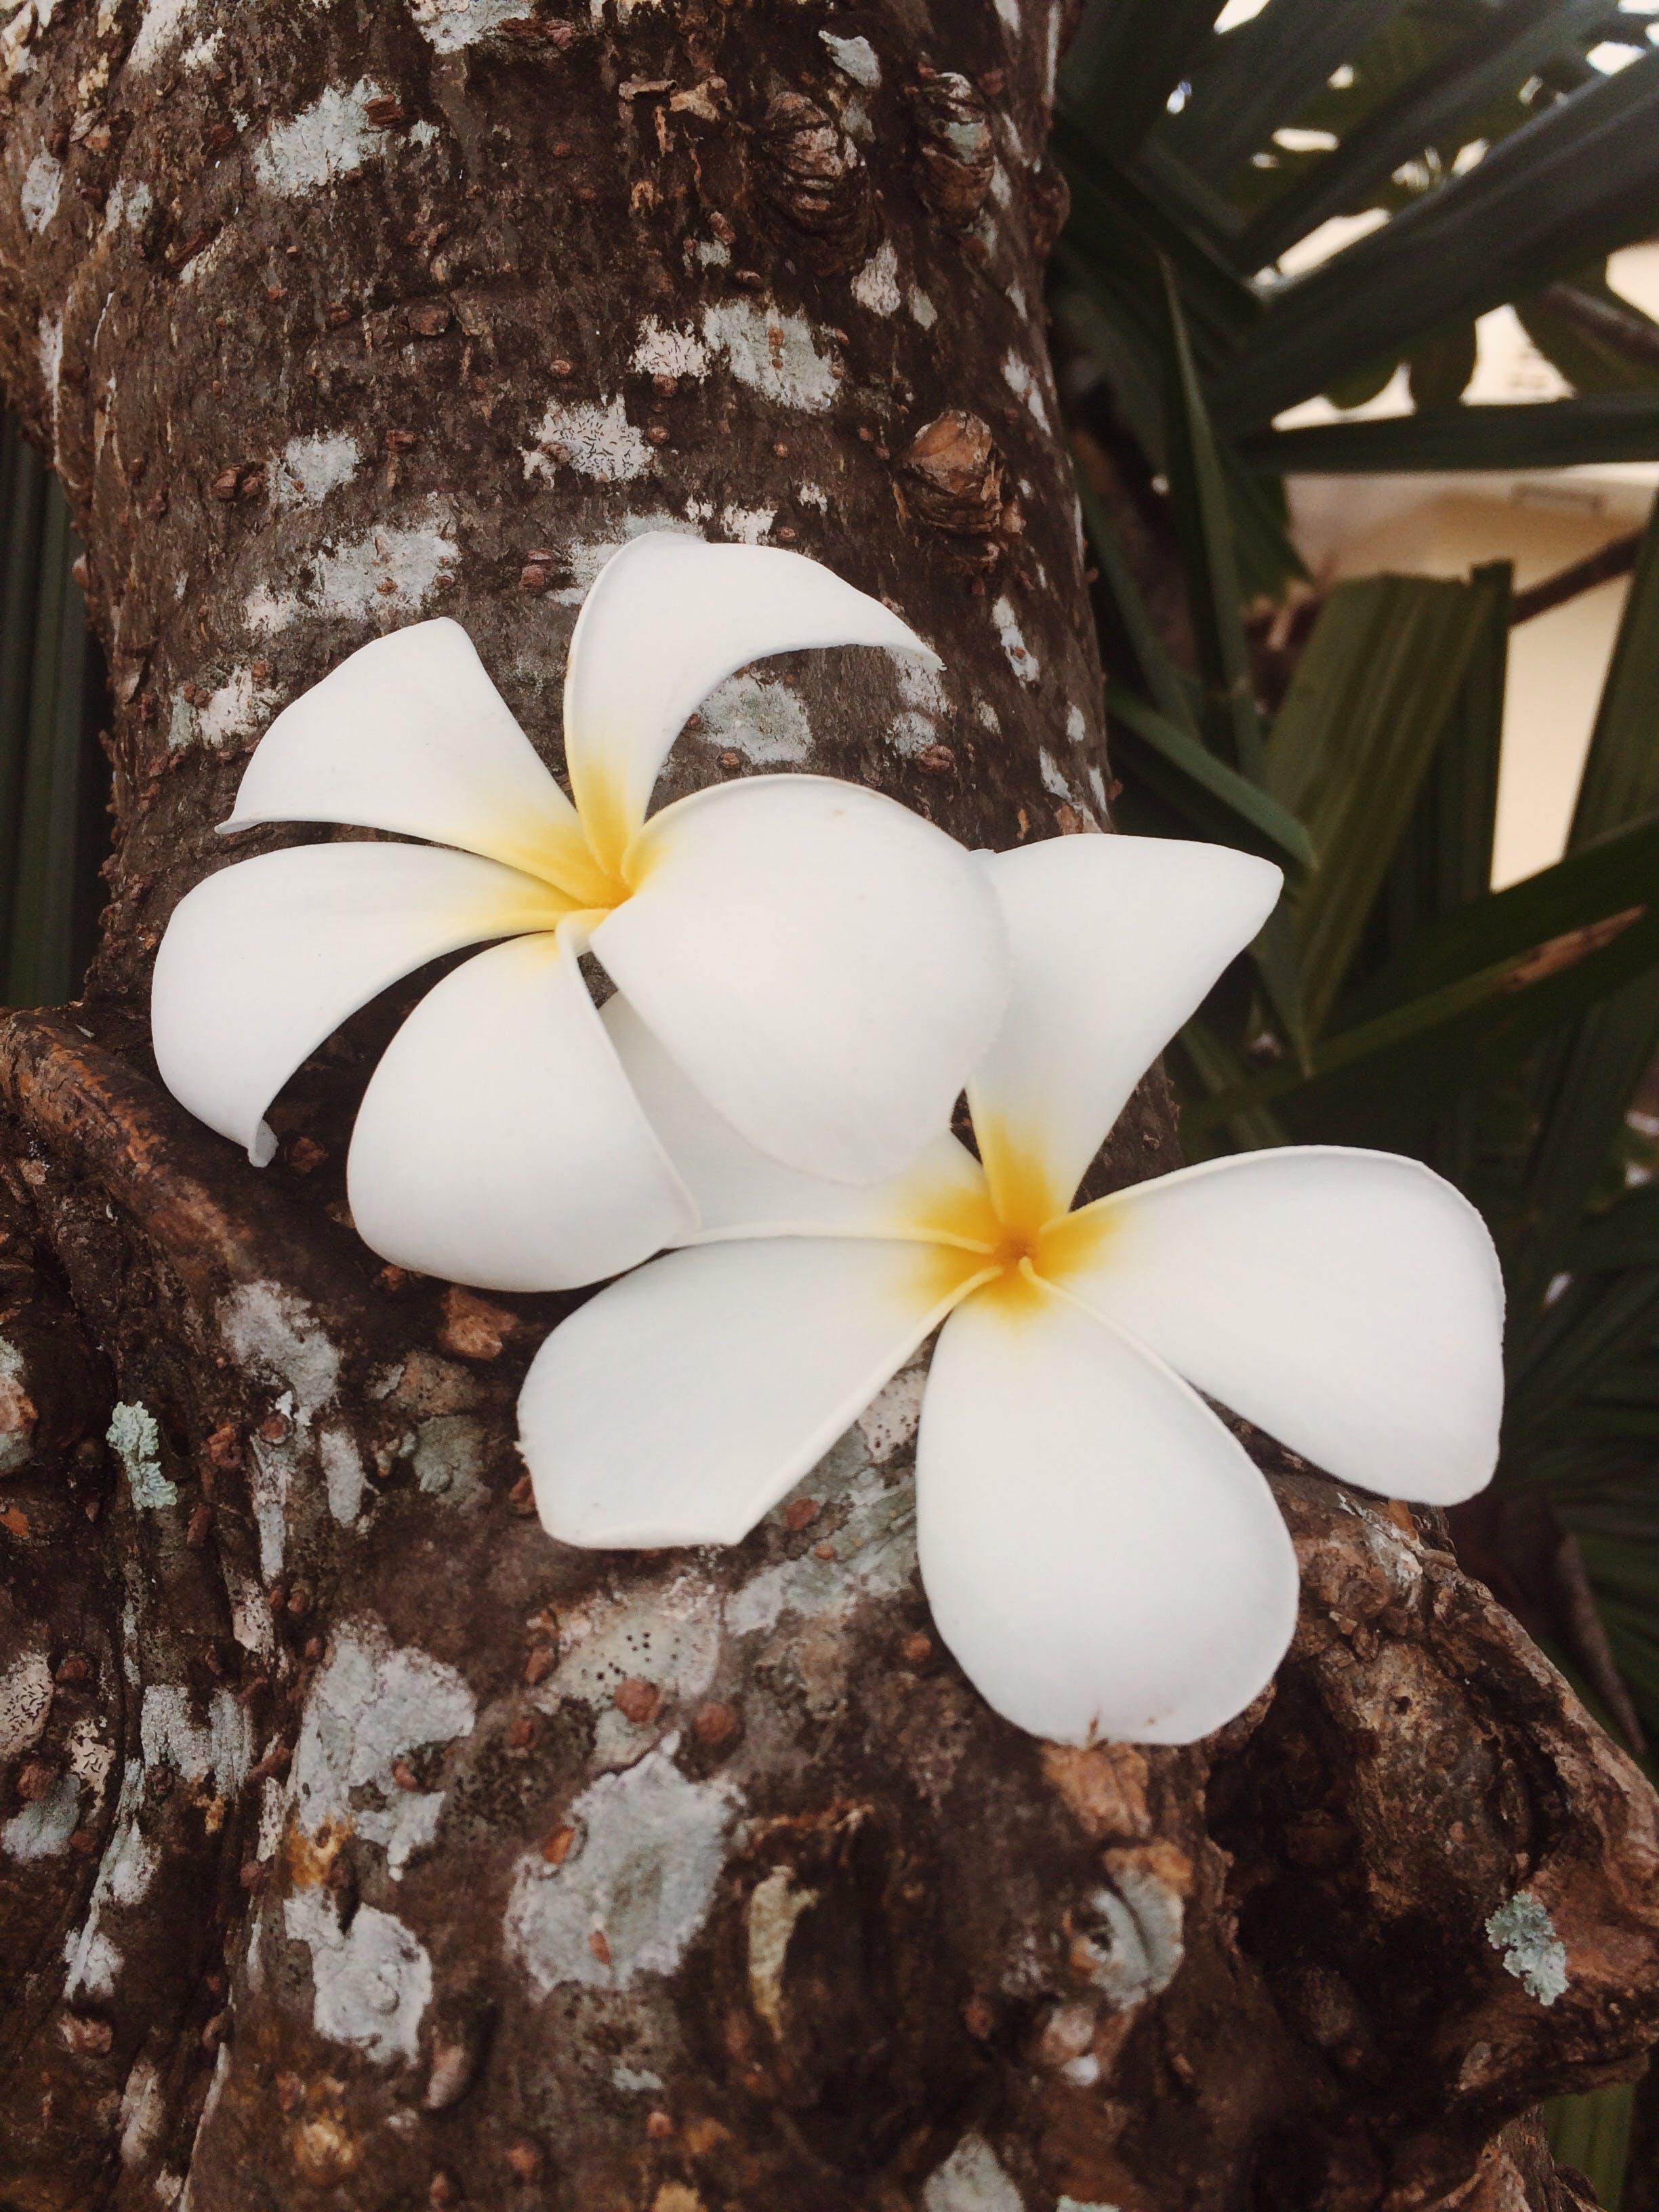 Free stock photo of flower, flowers, plumeria, tree